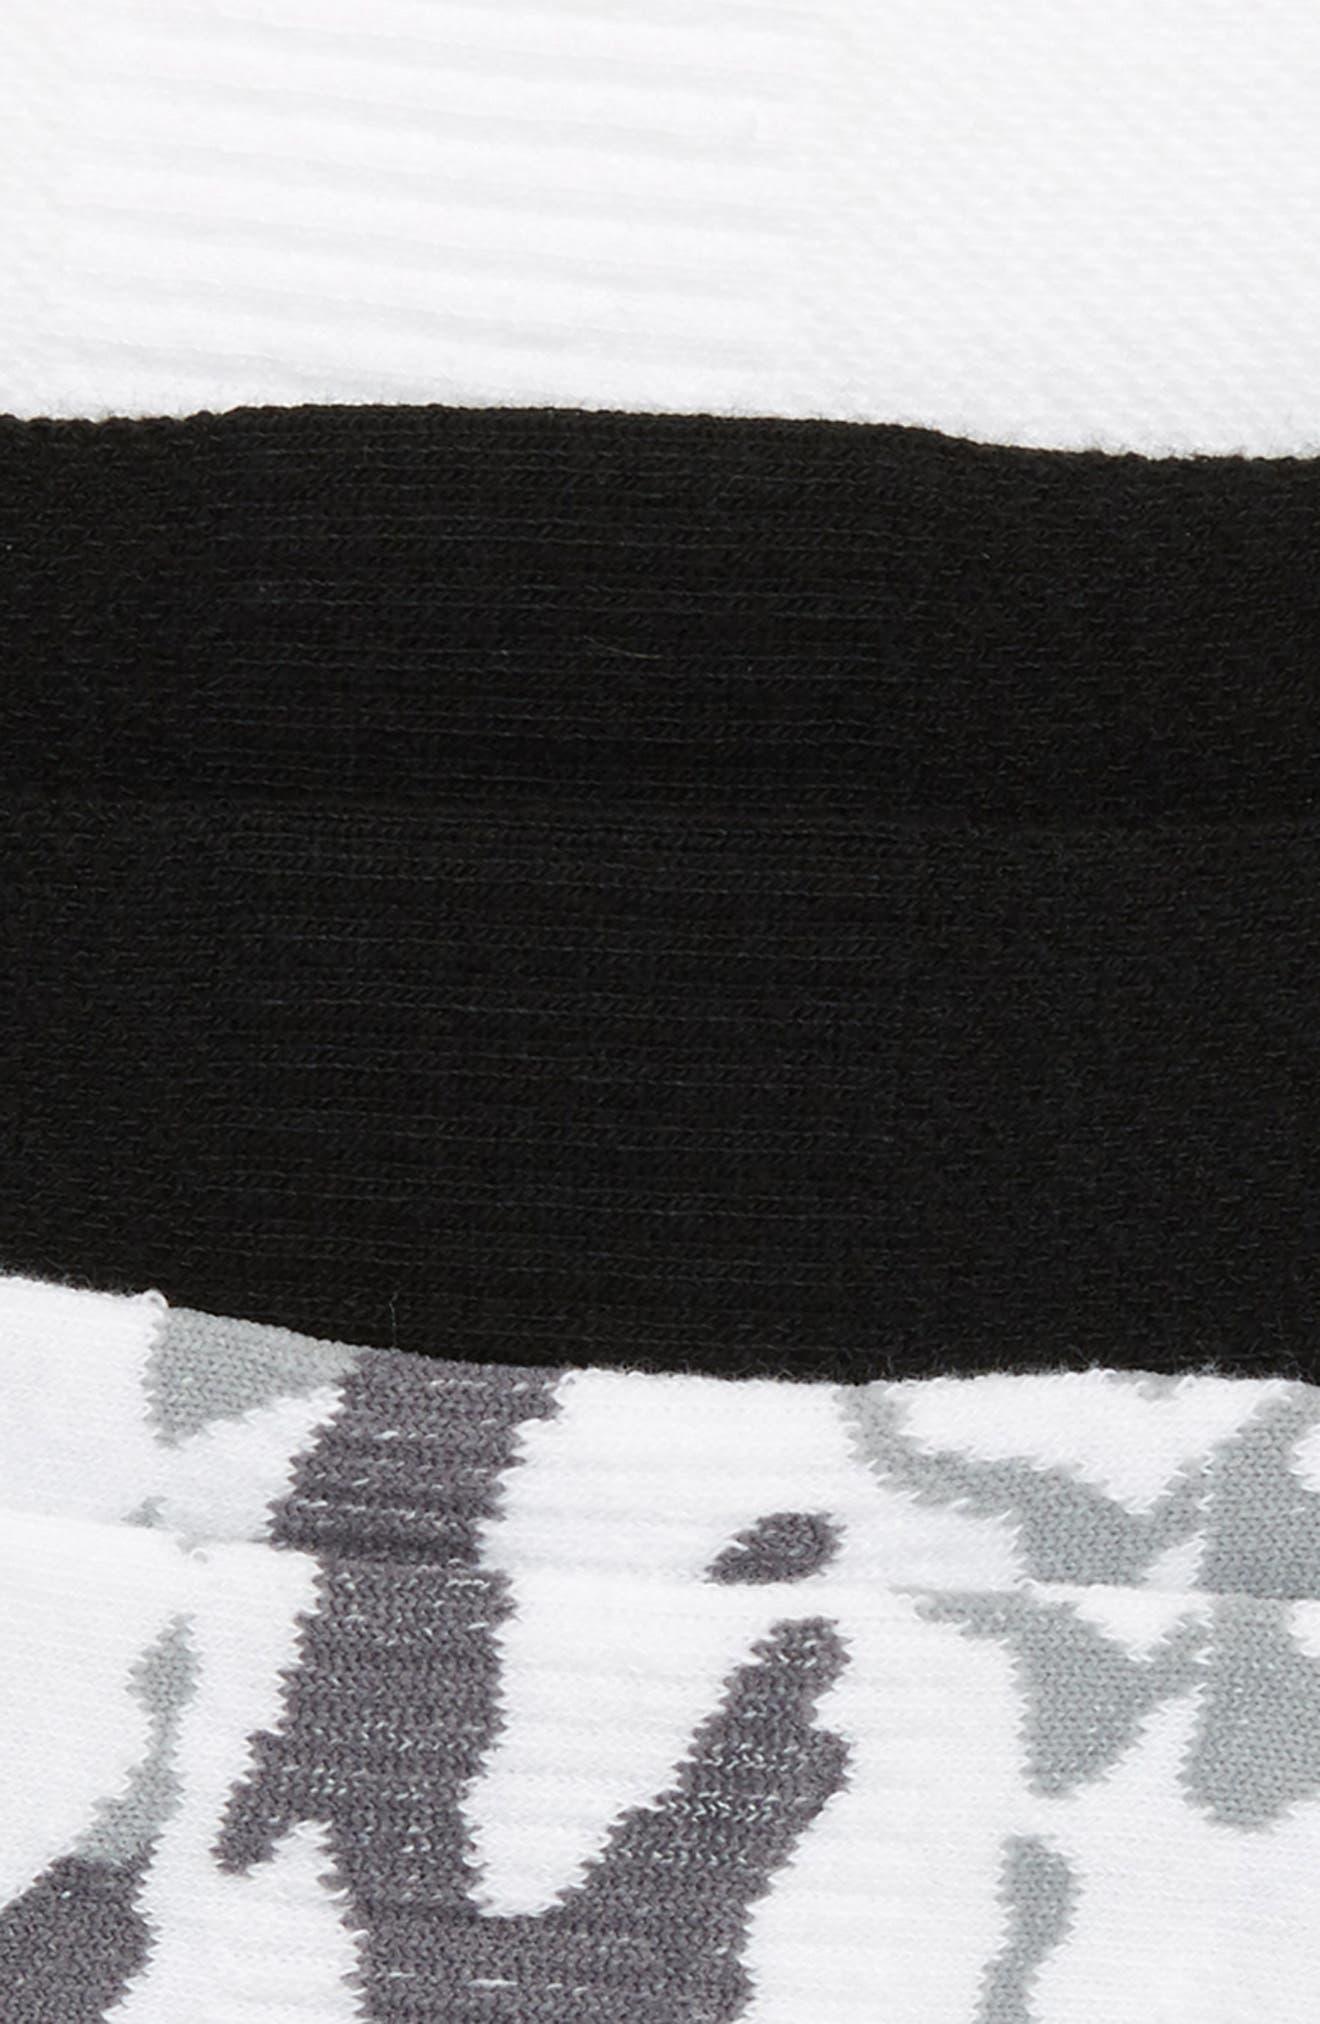 6-Pack Dri-FIT No-Show Socks,                             Alternate thumbnail 2, color,                             020